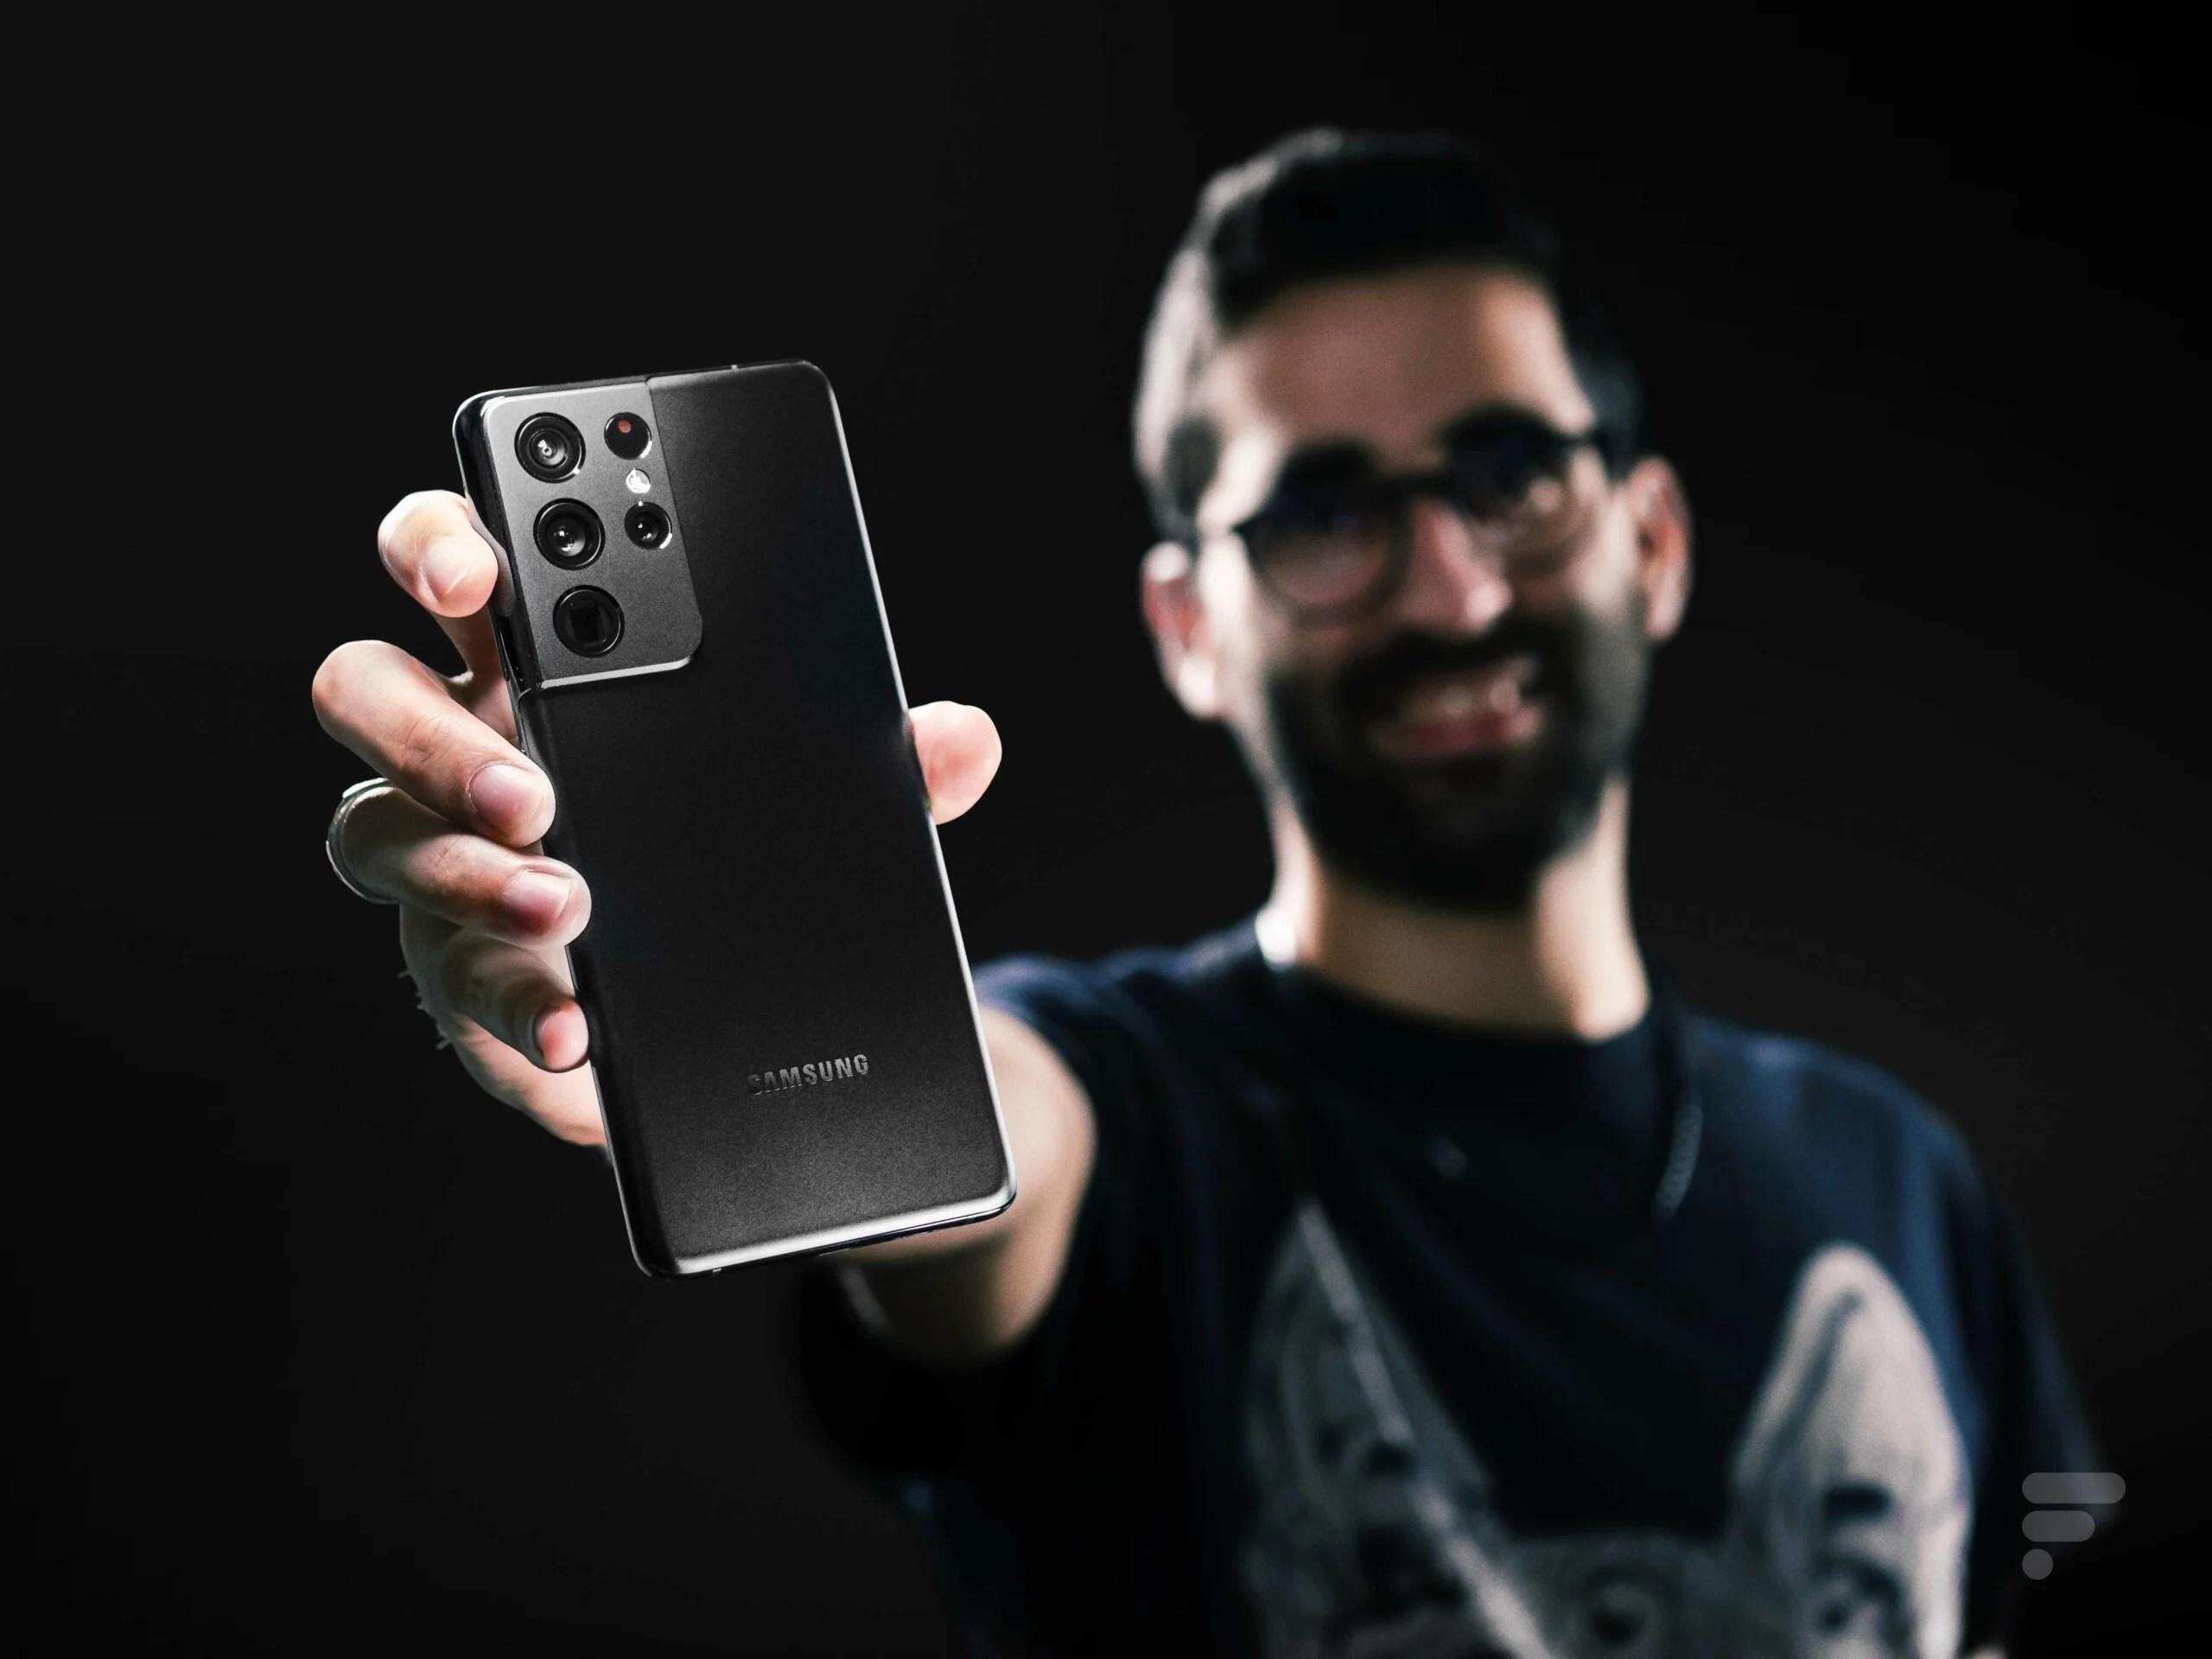 Samsung Galaxy S21 Ultra Snapdragon 888 vs Exynos 2100 : un combat serré selon nos mesures